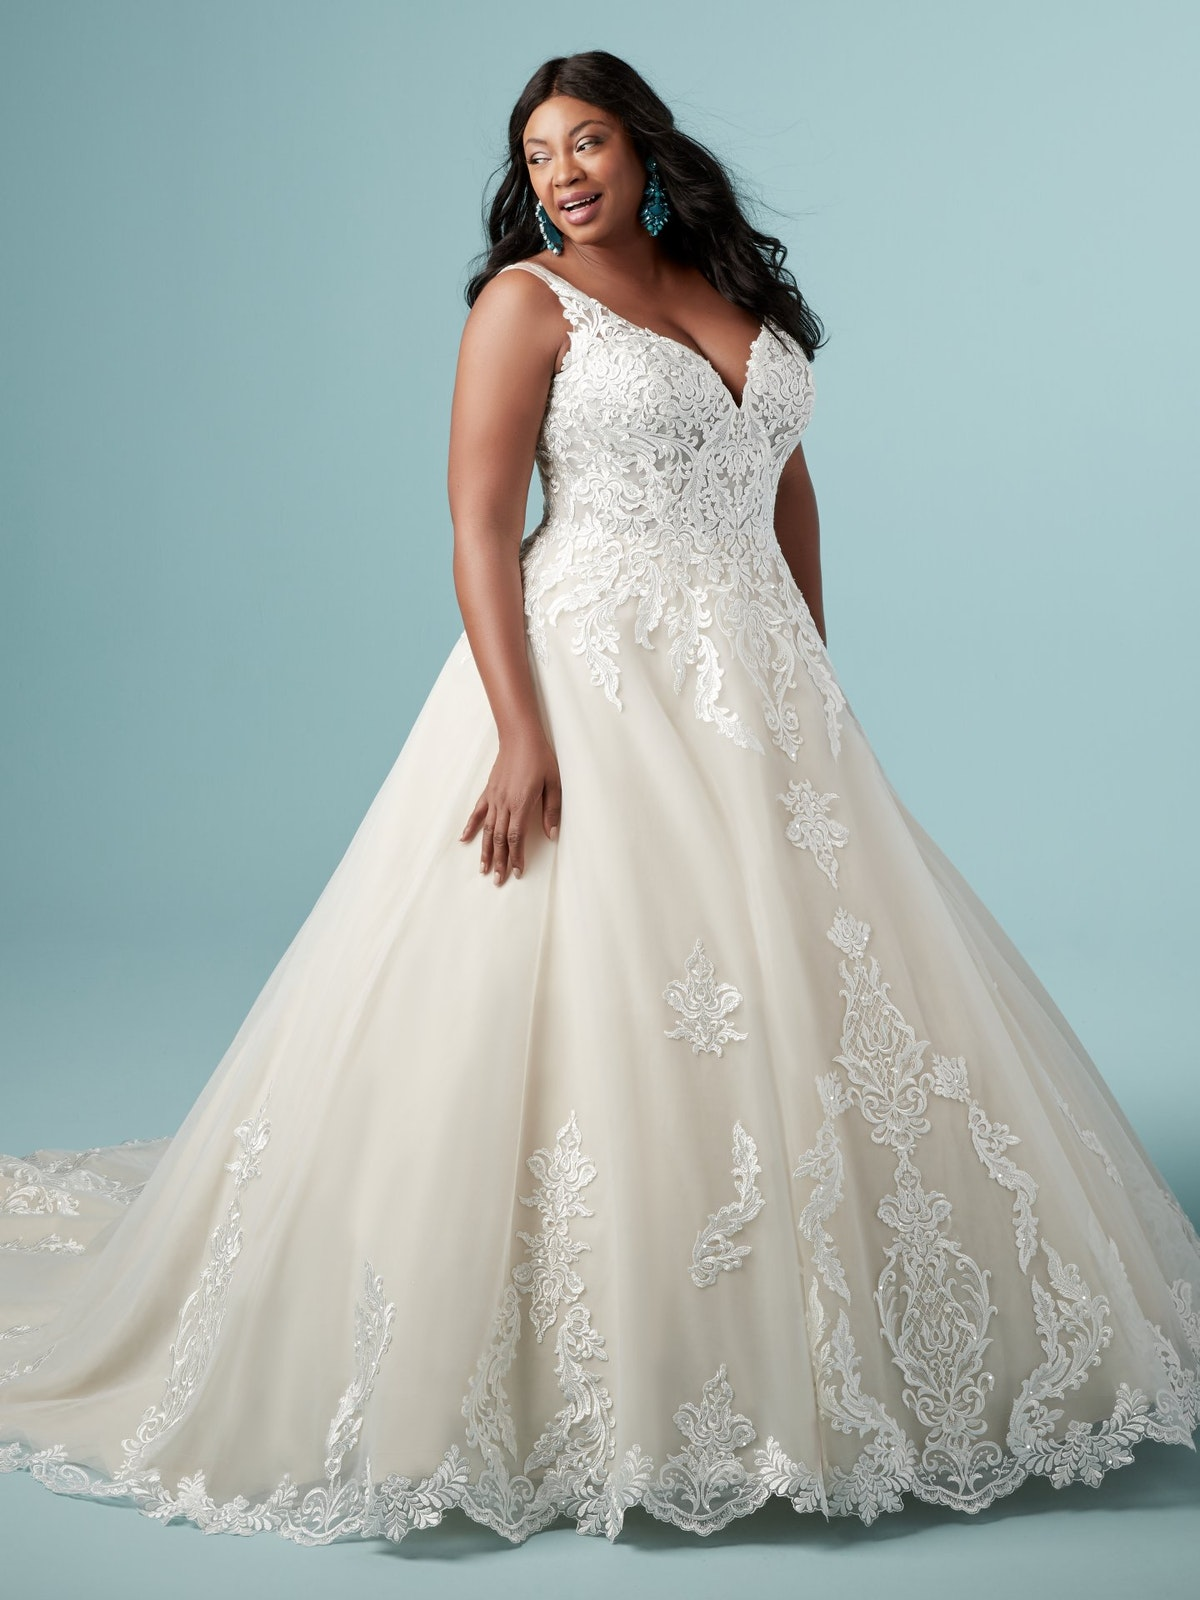 Trinity Lynette (Curve) (9MS902AC) Unique Lace Ballgown Wedding Dress by Maggie Sottero